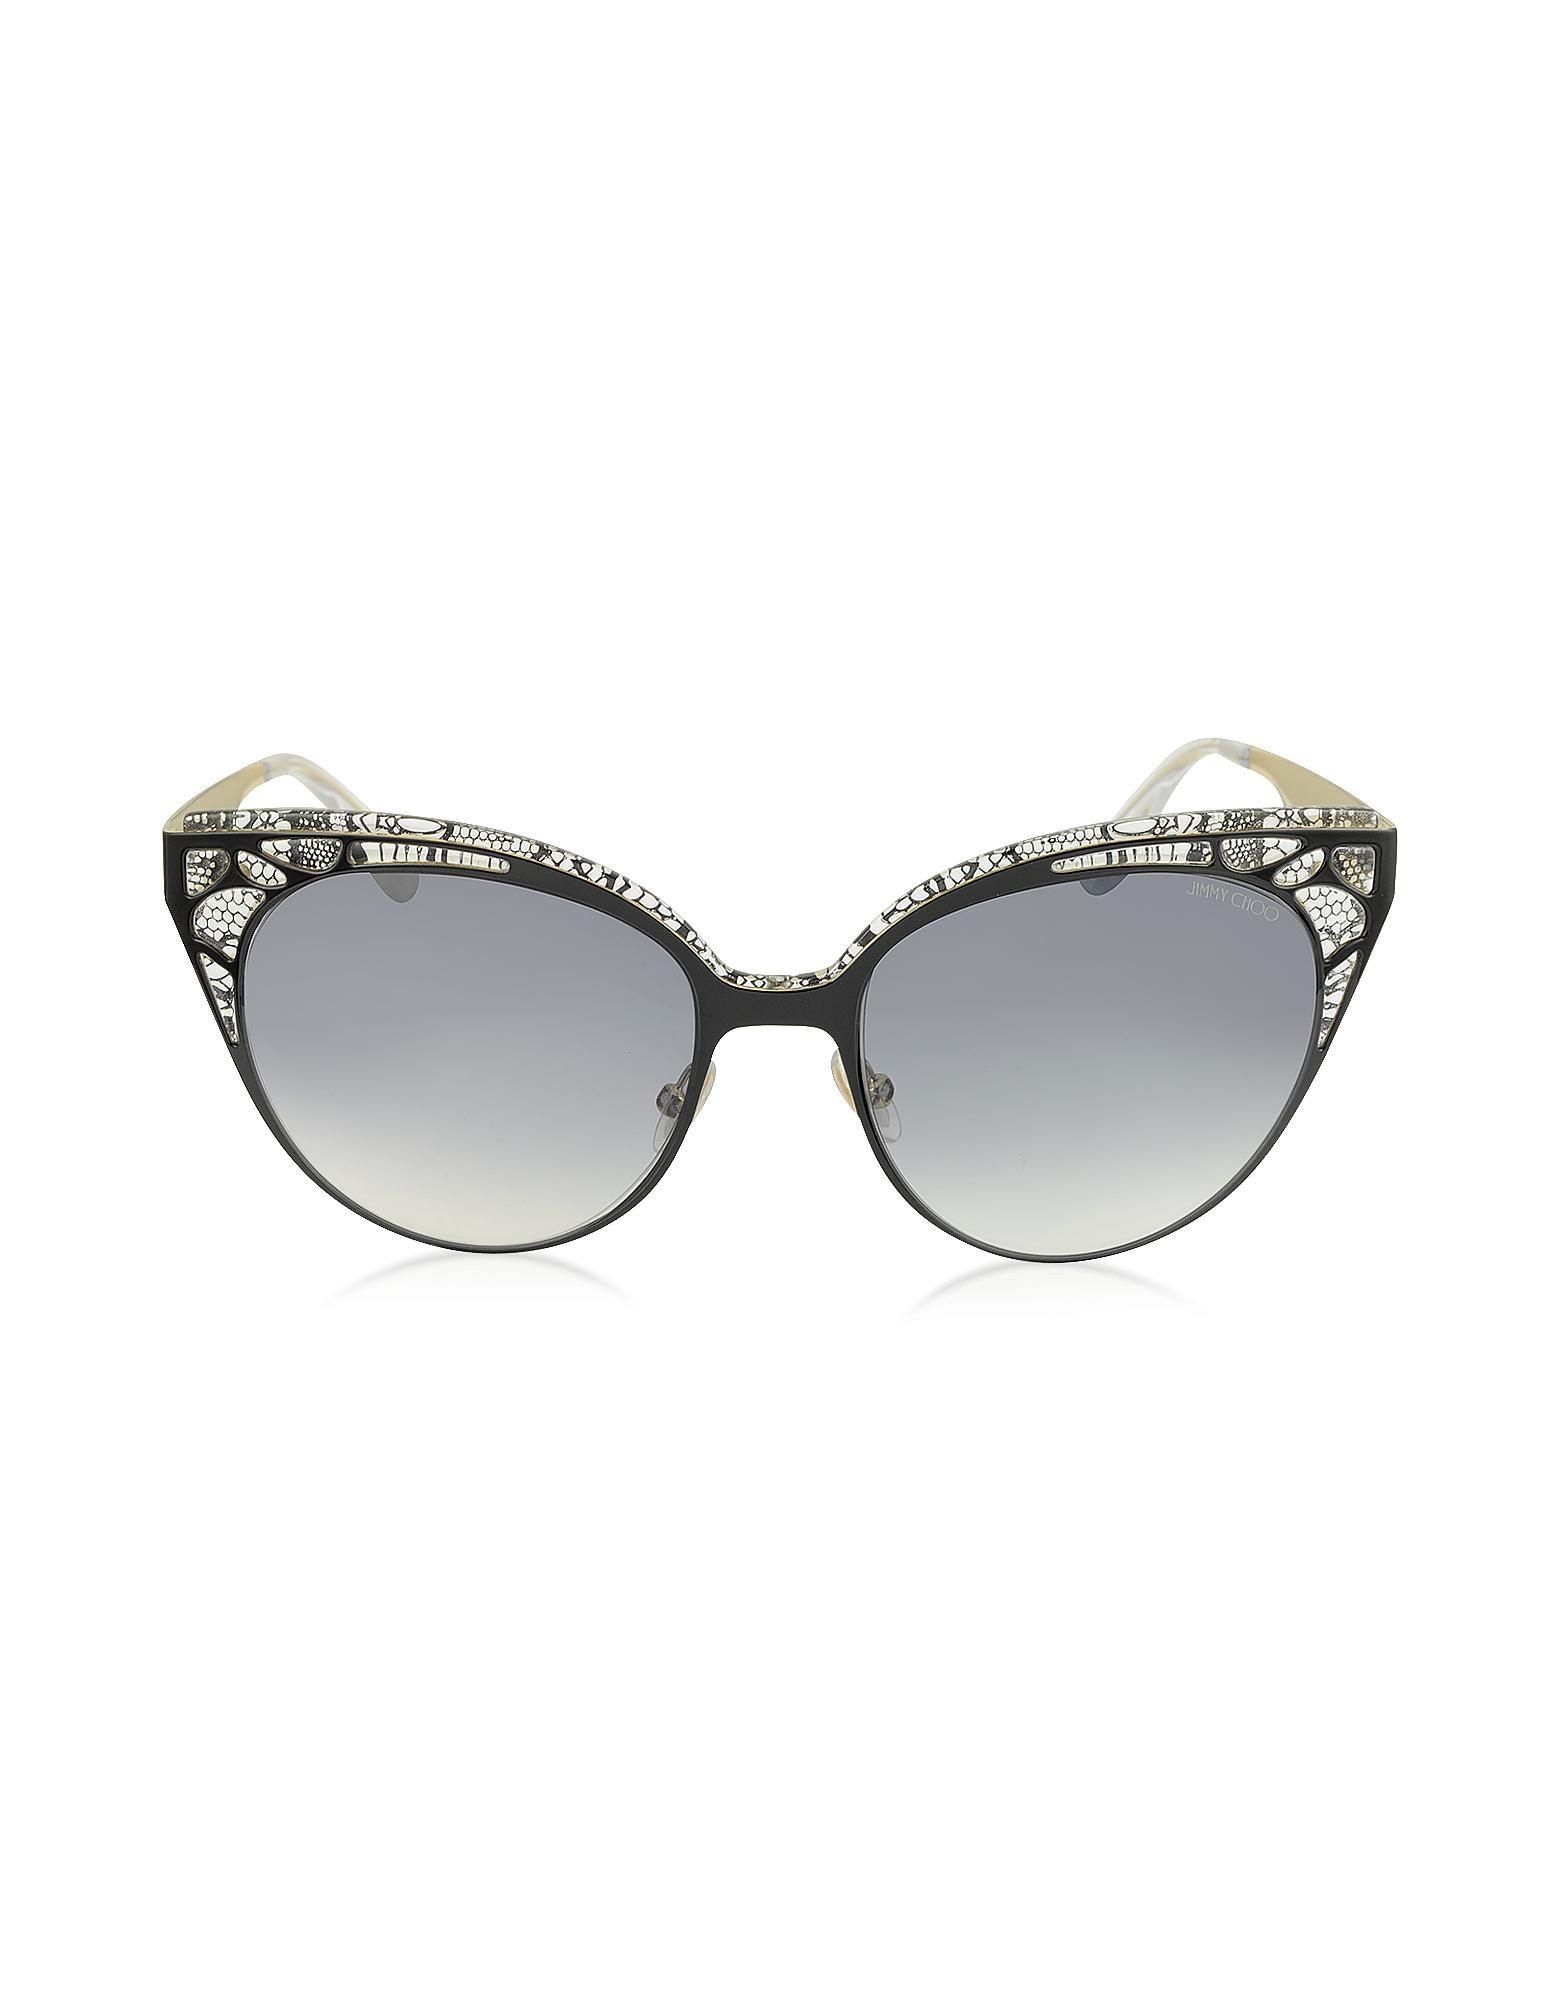 074dc766dc9e Jimmy Choo - Estelle s Enylf Black Metal Lace Cat Eye Sunglasses - Lyst.  View fullscreen